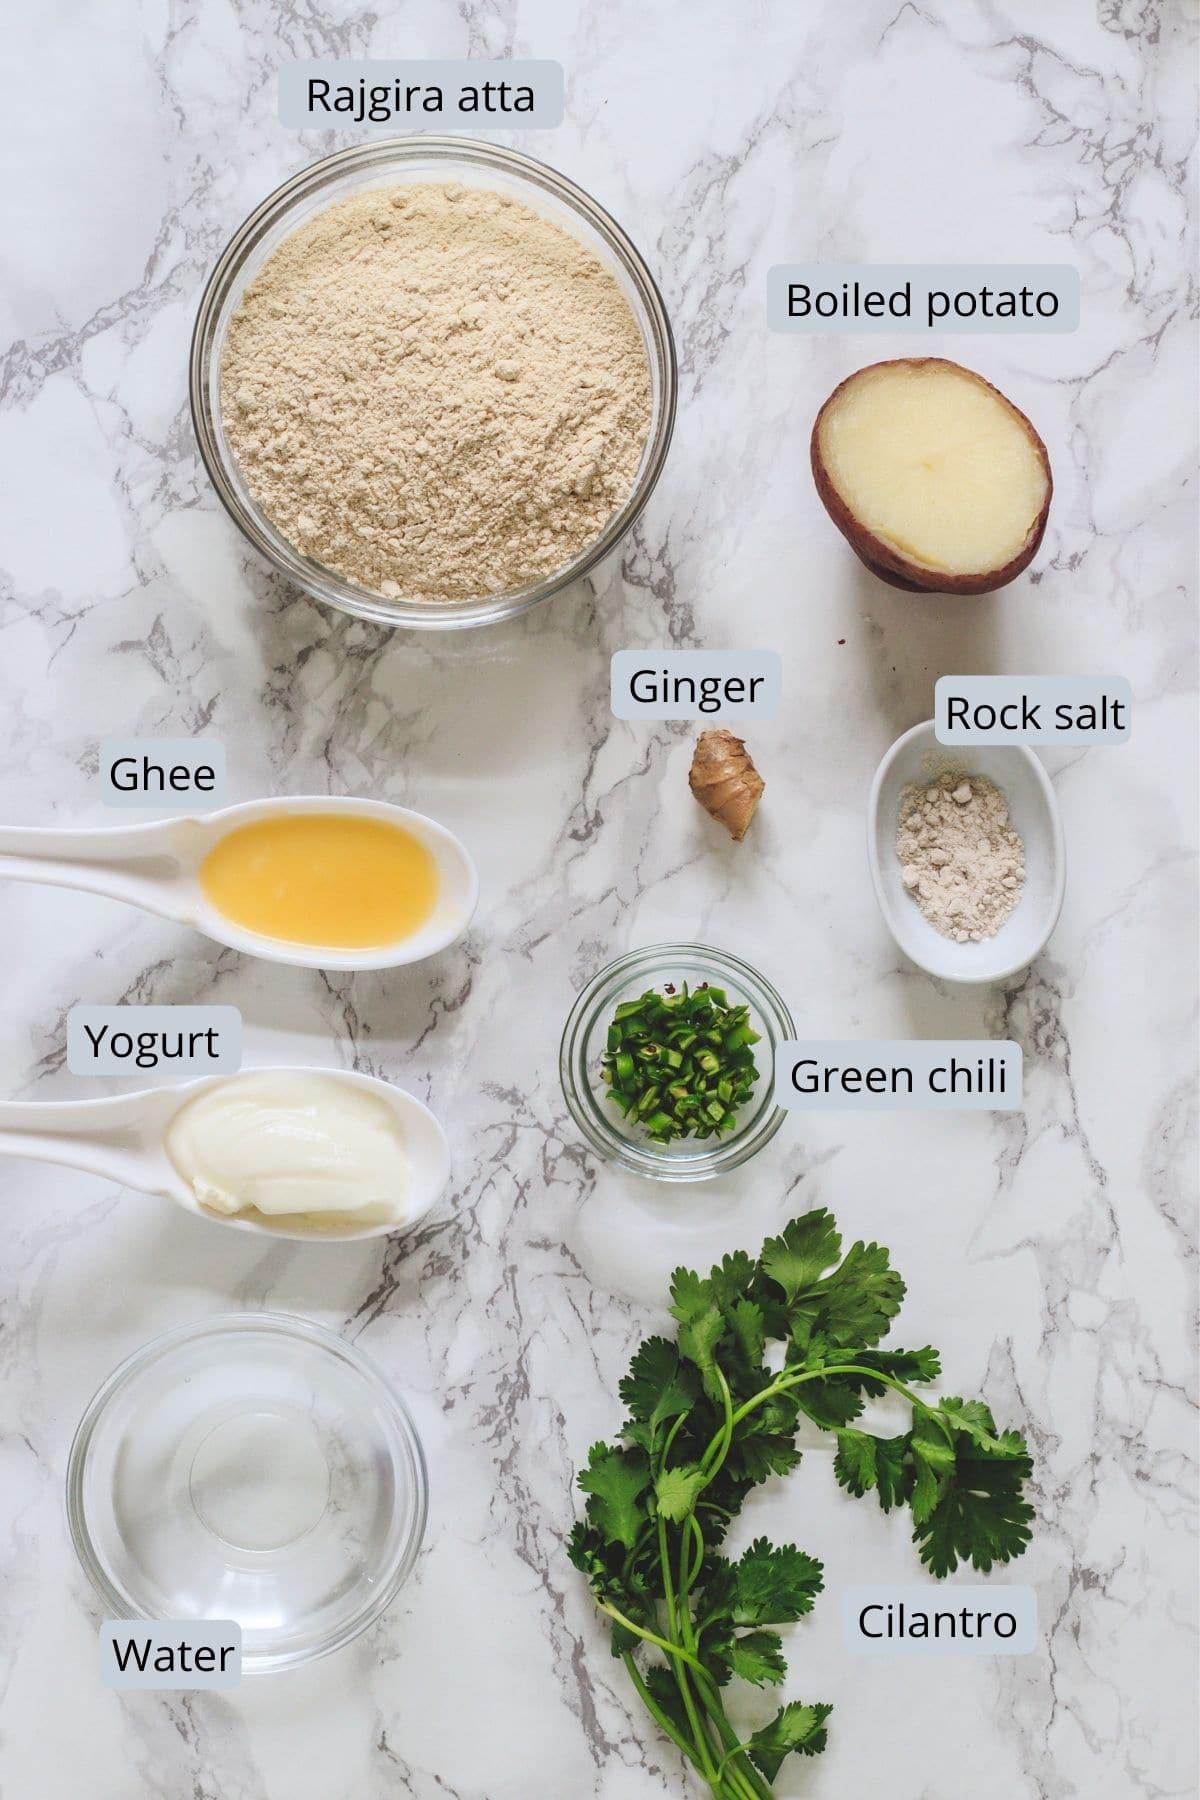 Ingredients used in rajgira paratha includes amaranth flour, boiled potato, ghee, yogurt, rock salt, ginger, green chili, cilantro and water.